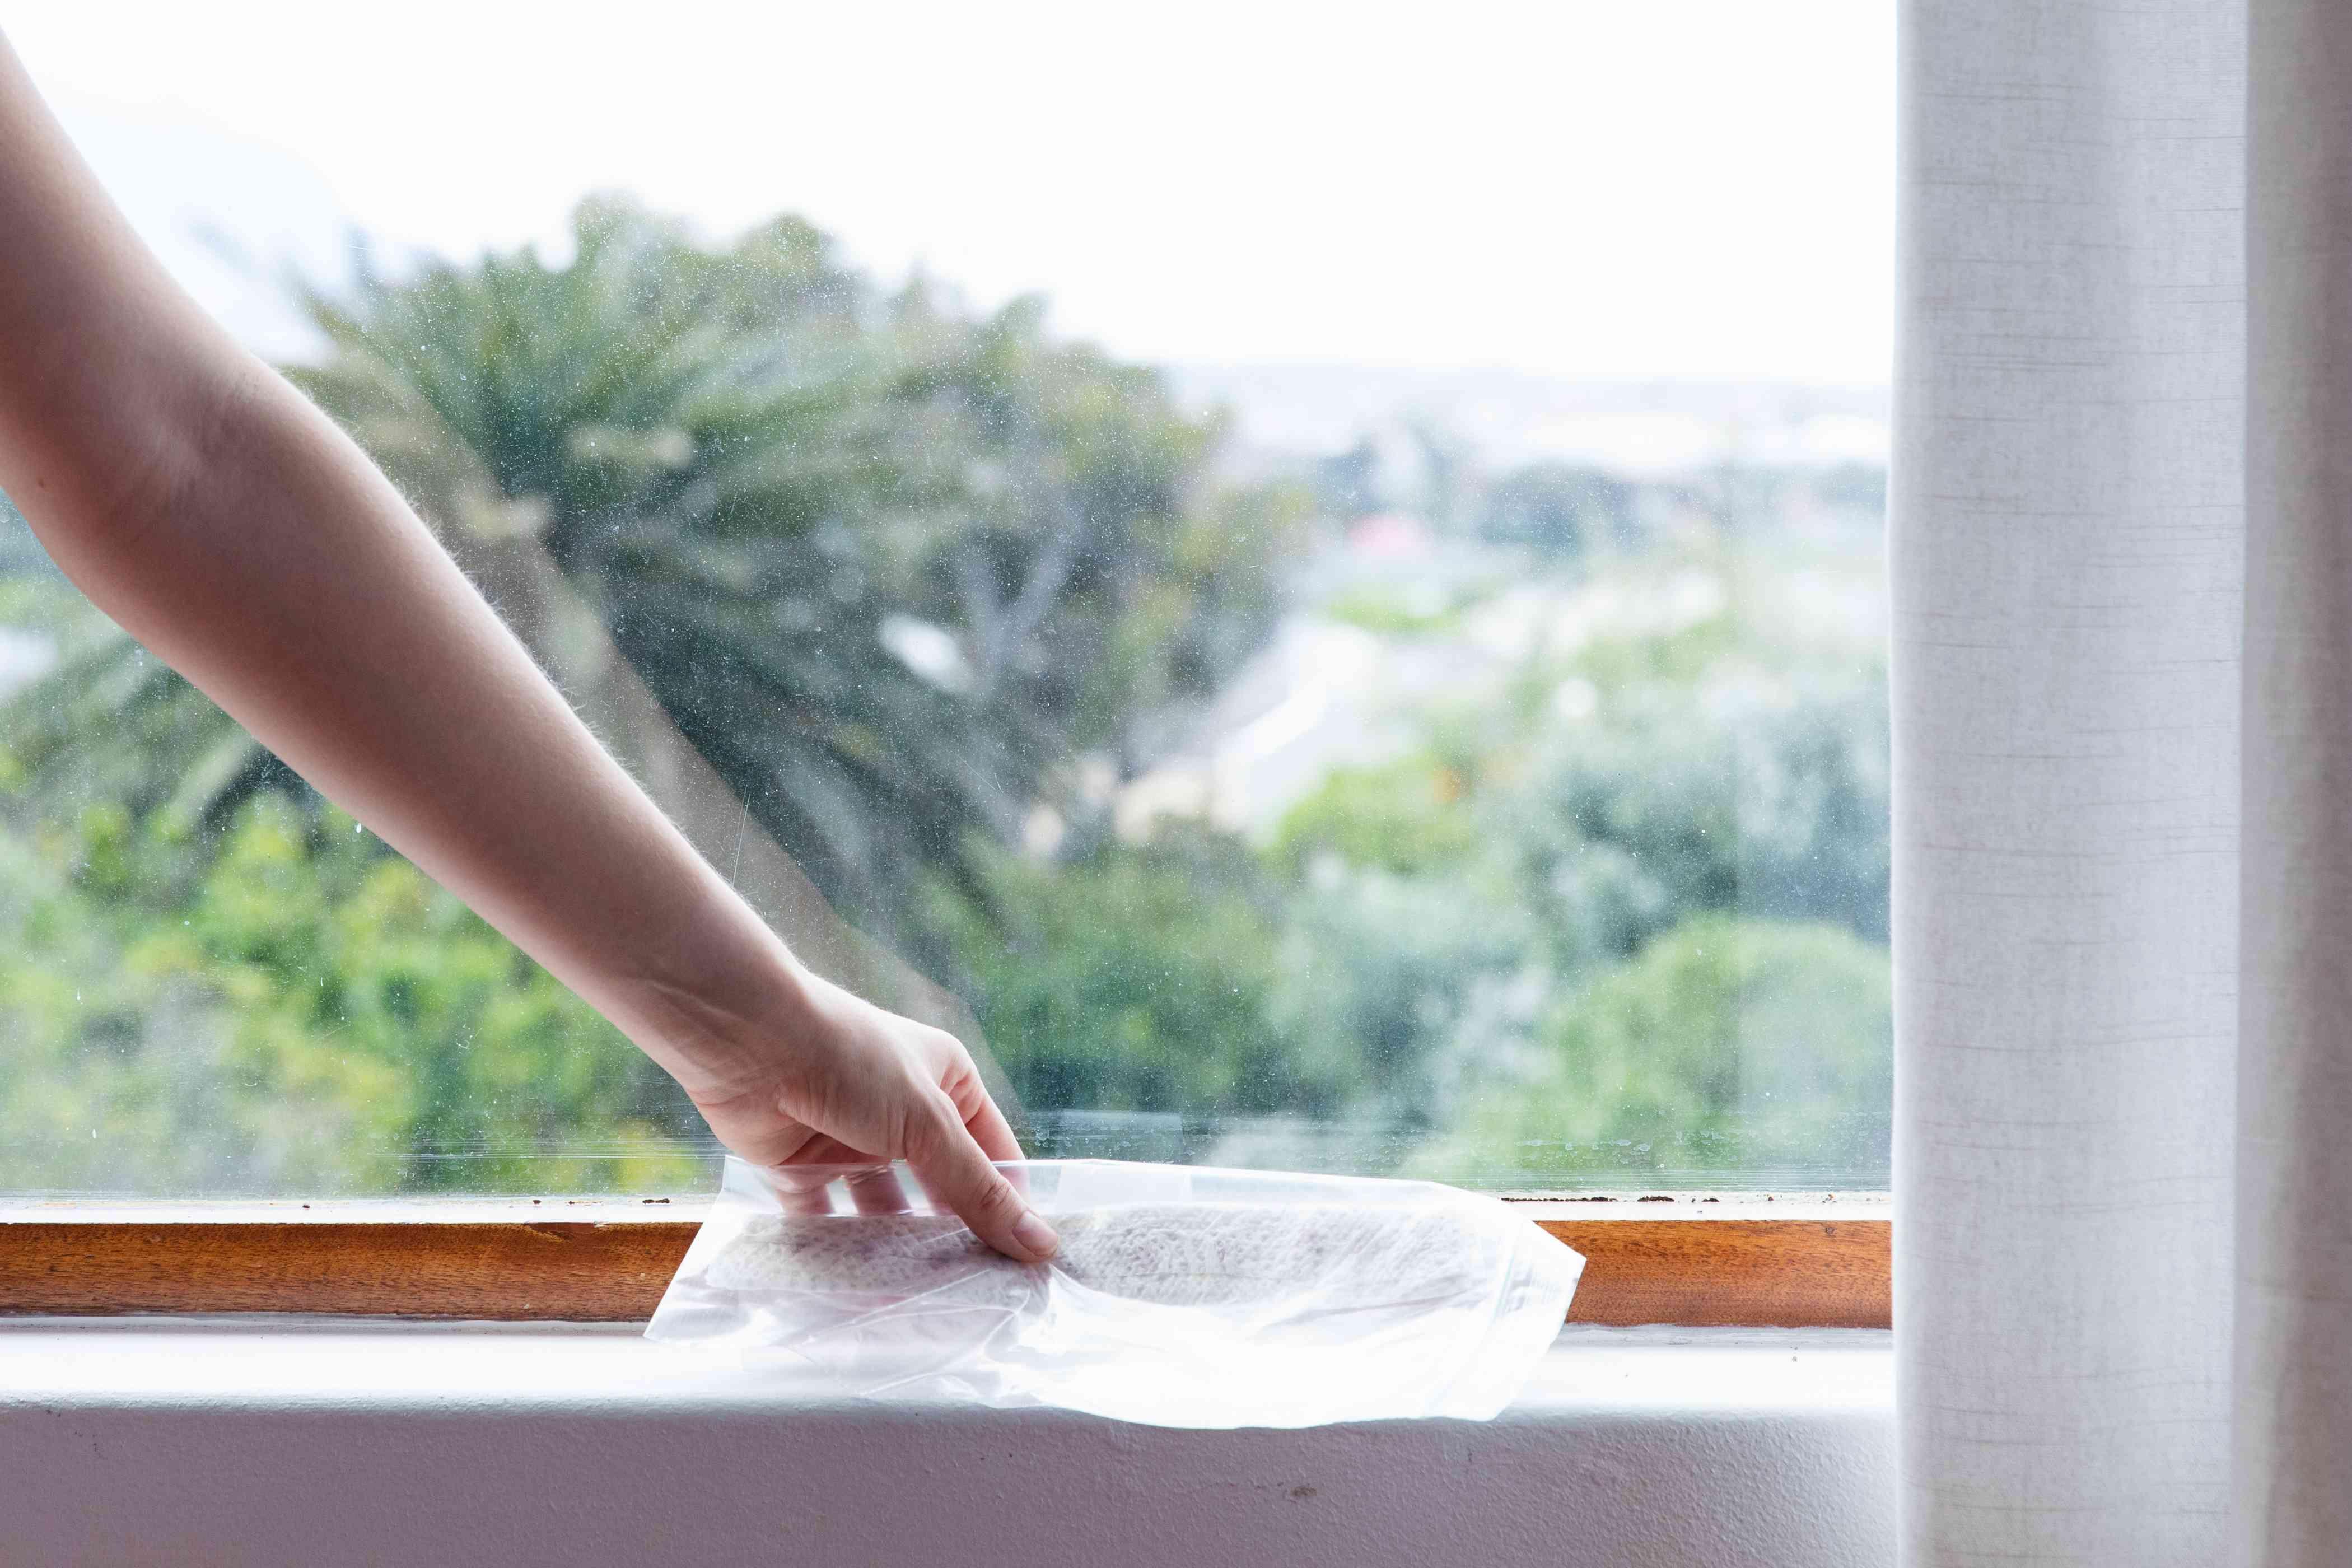 placing seeds on the windowsill